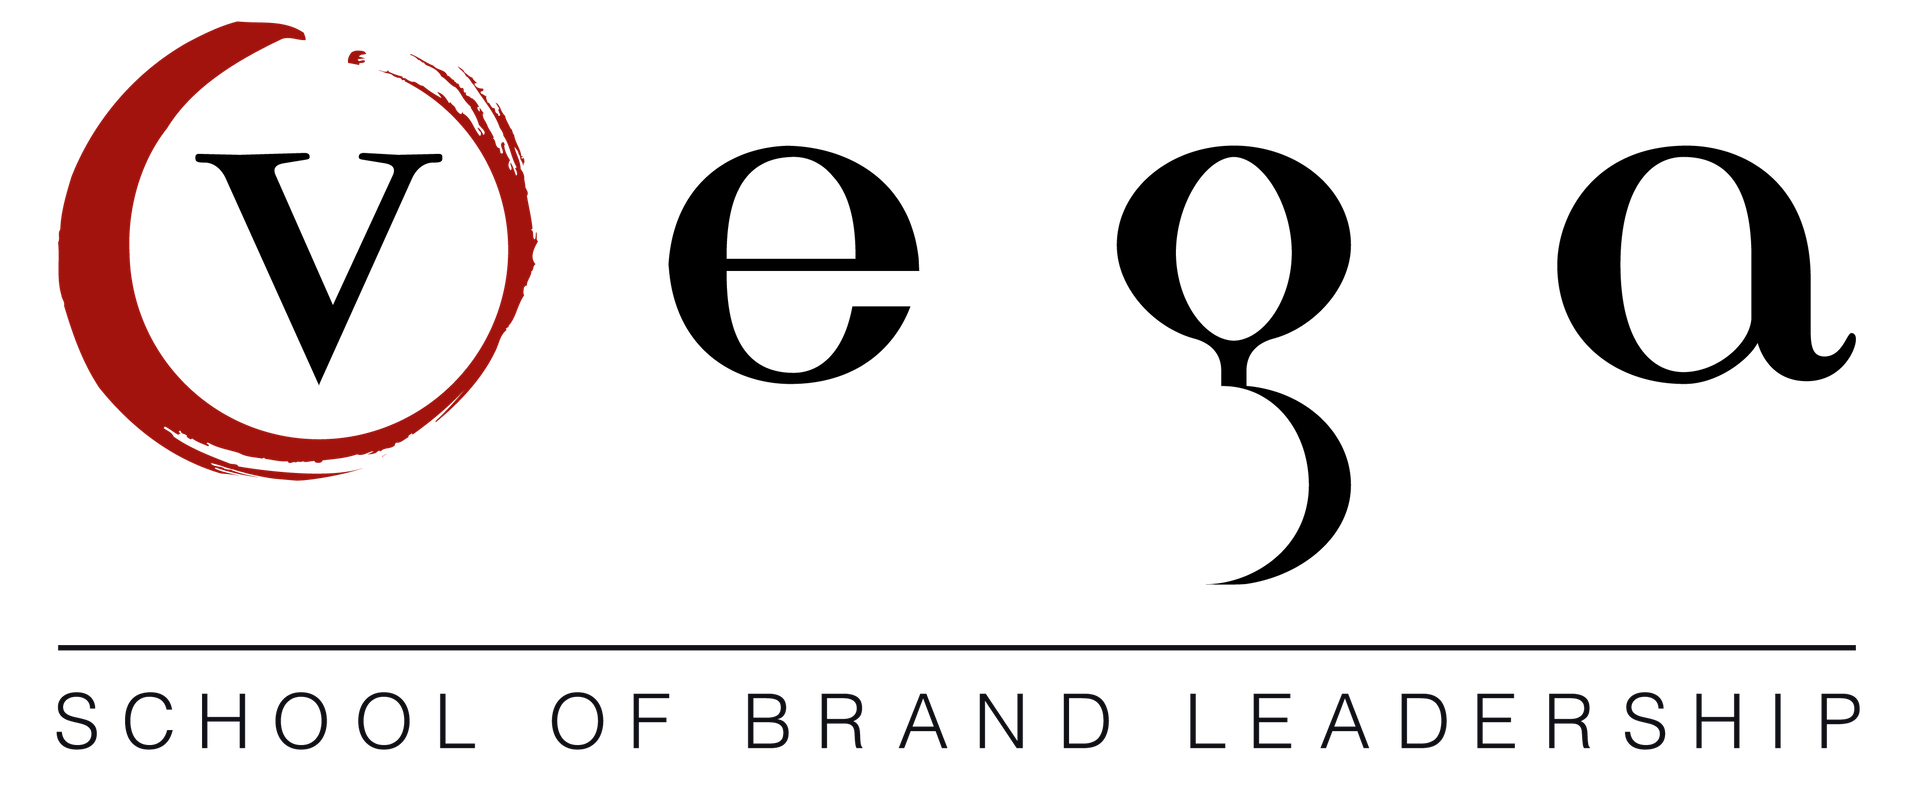 Interactive Room Design Vega School Of Brand Leadership Design Indaba